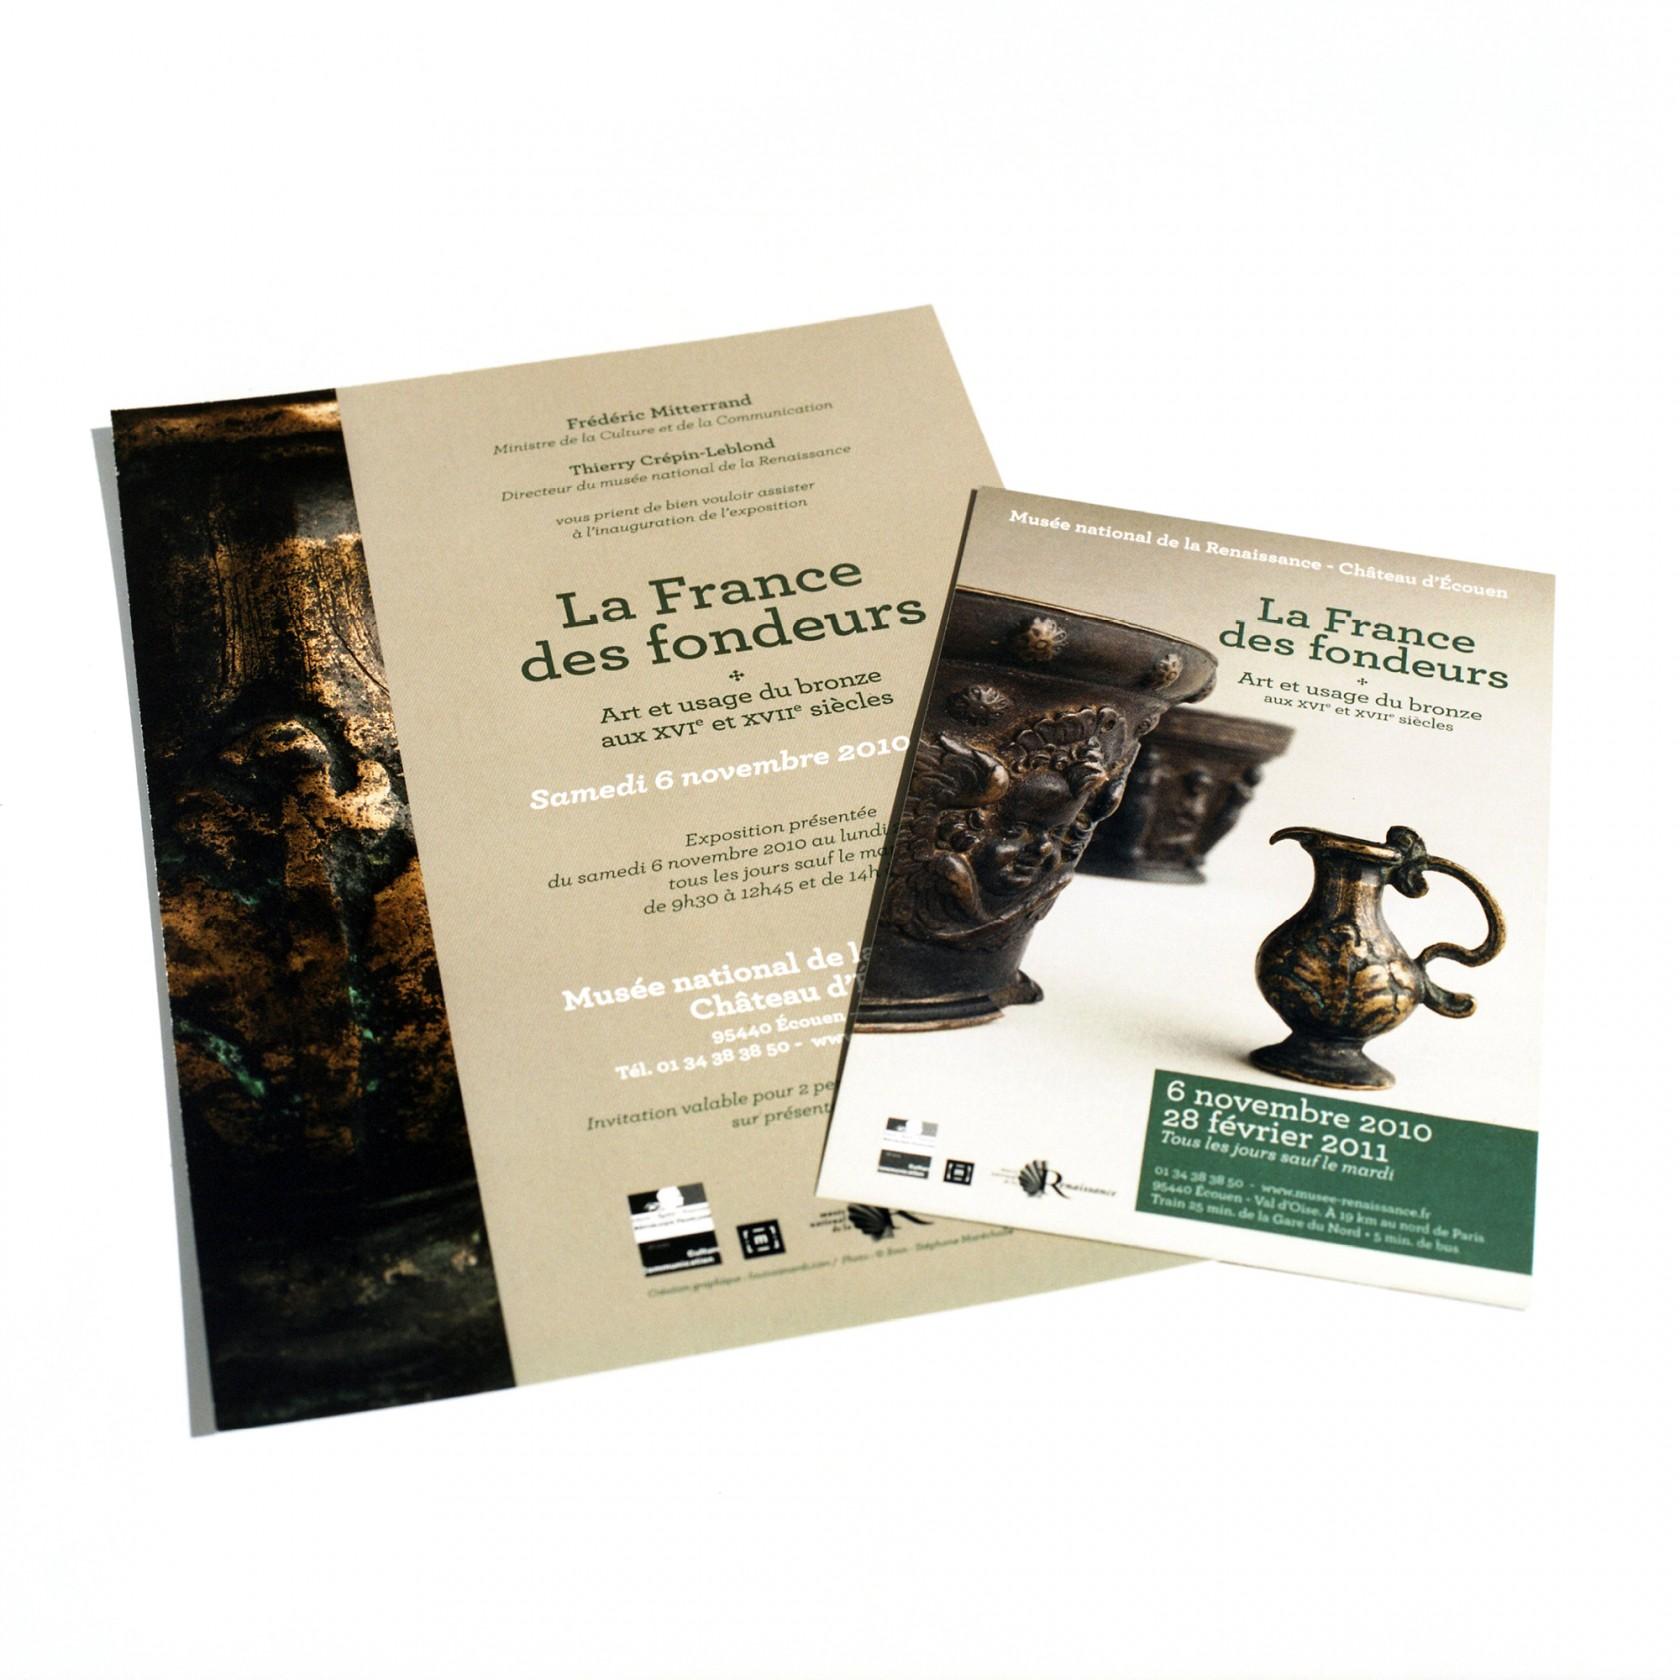 fouinzanardi -  fz_print_rp_com_museedelarenaissance6